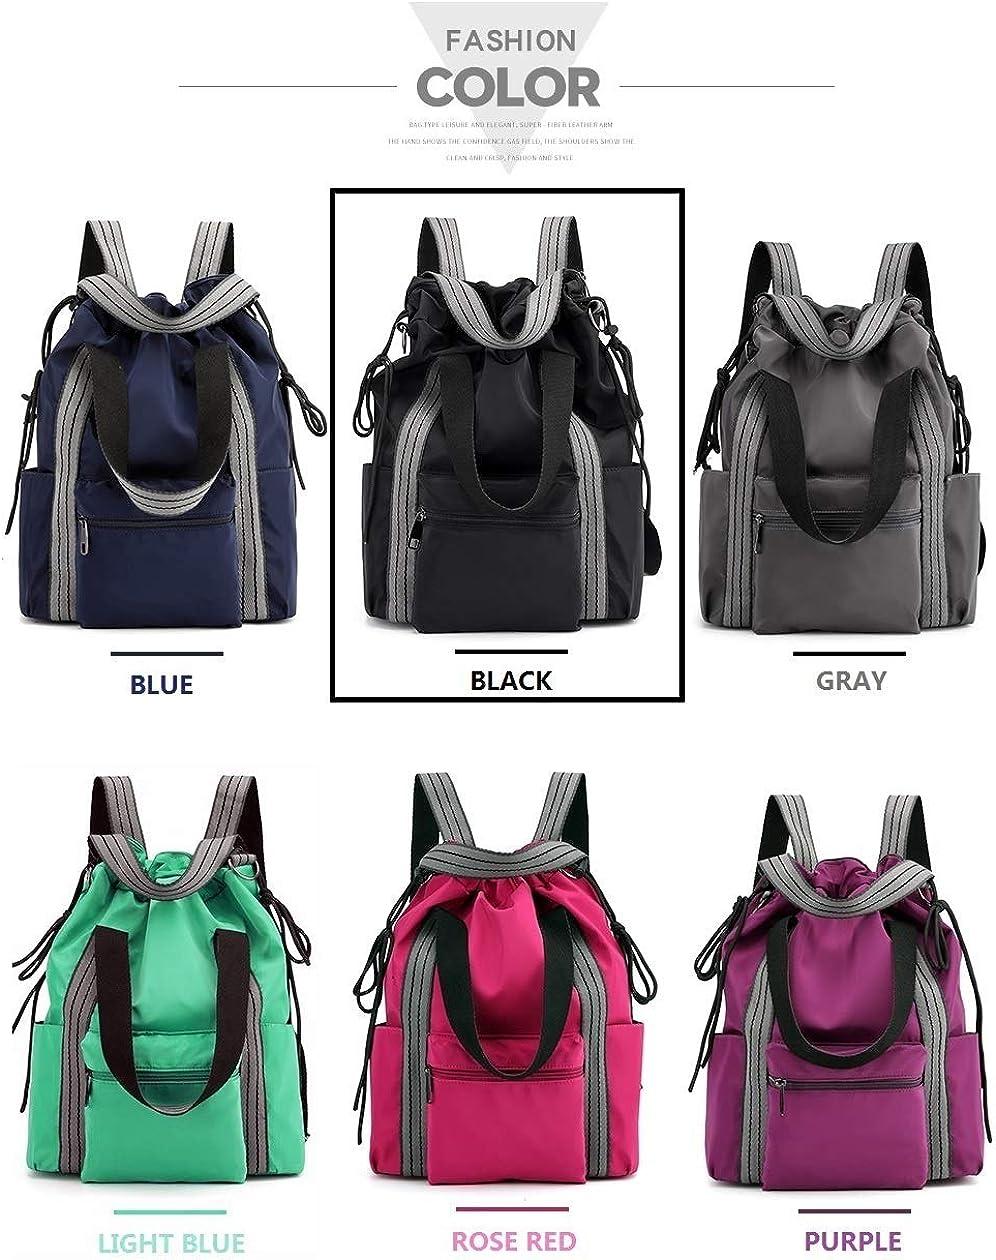 Lightweight Large Capacity Laptop Backpack Tote Bags Shoulder Bag